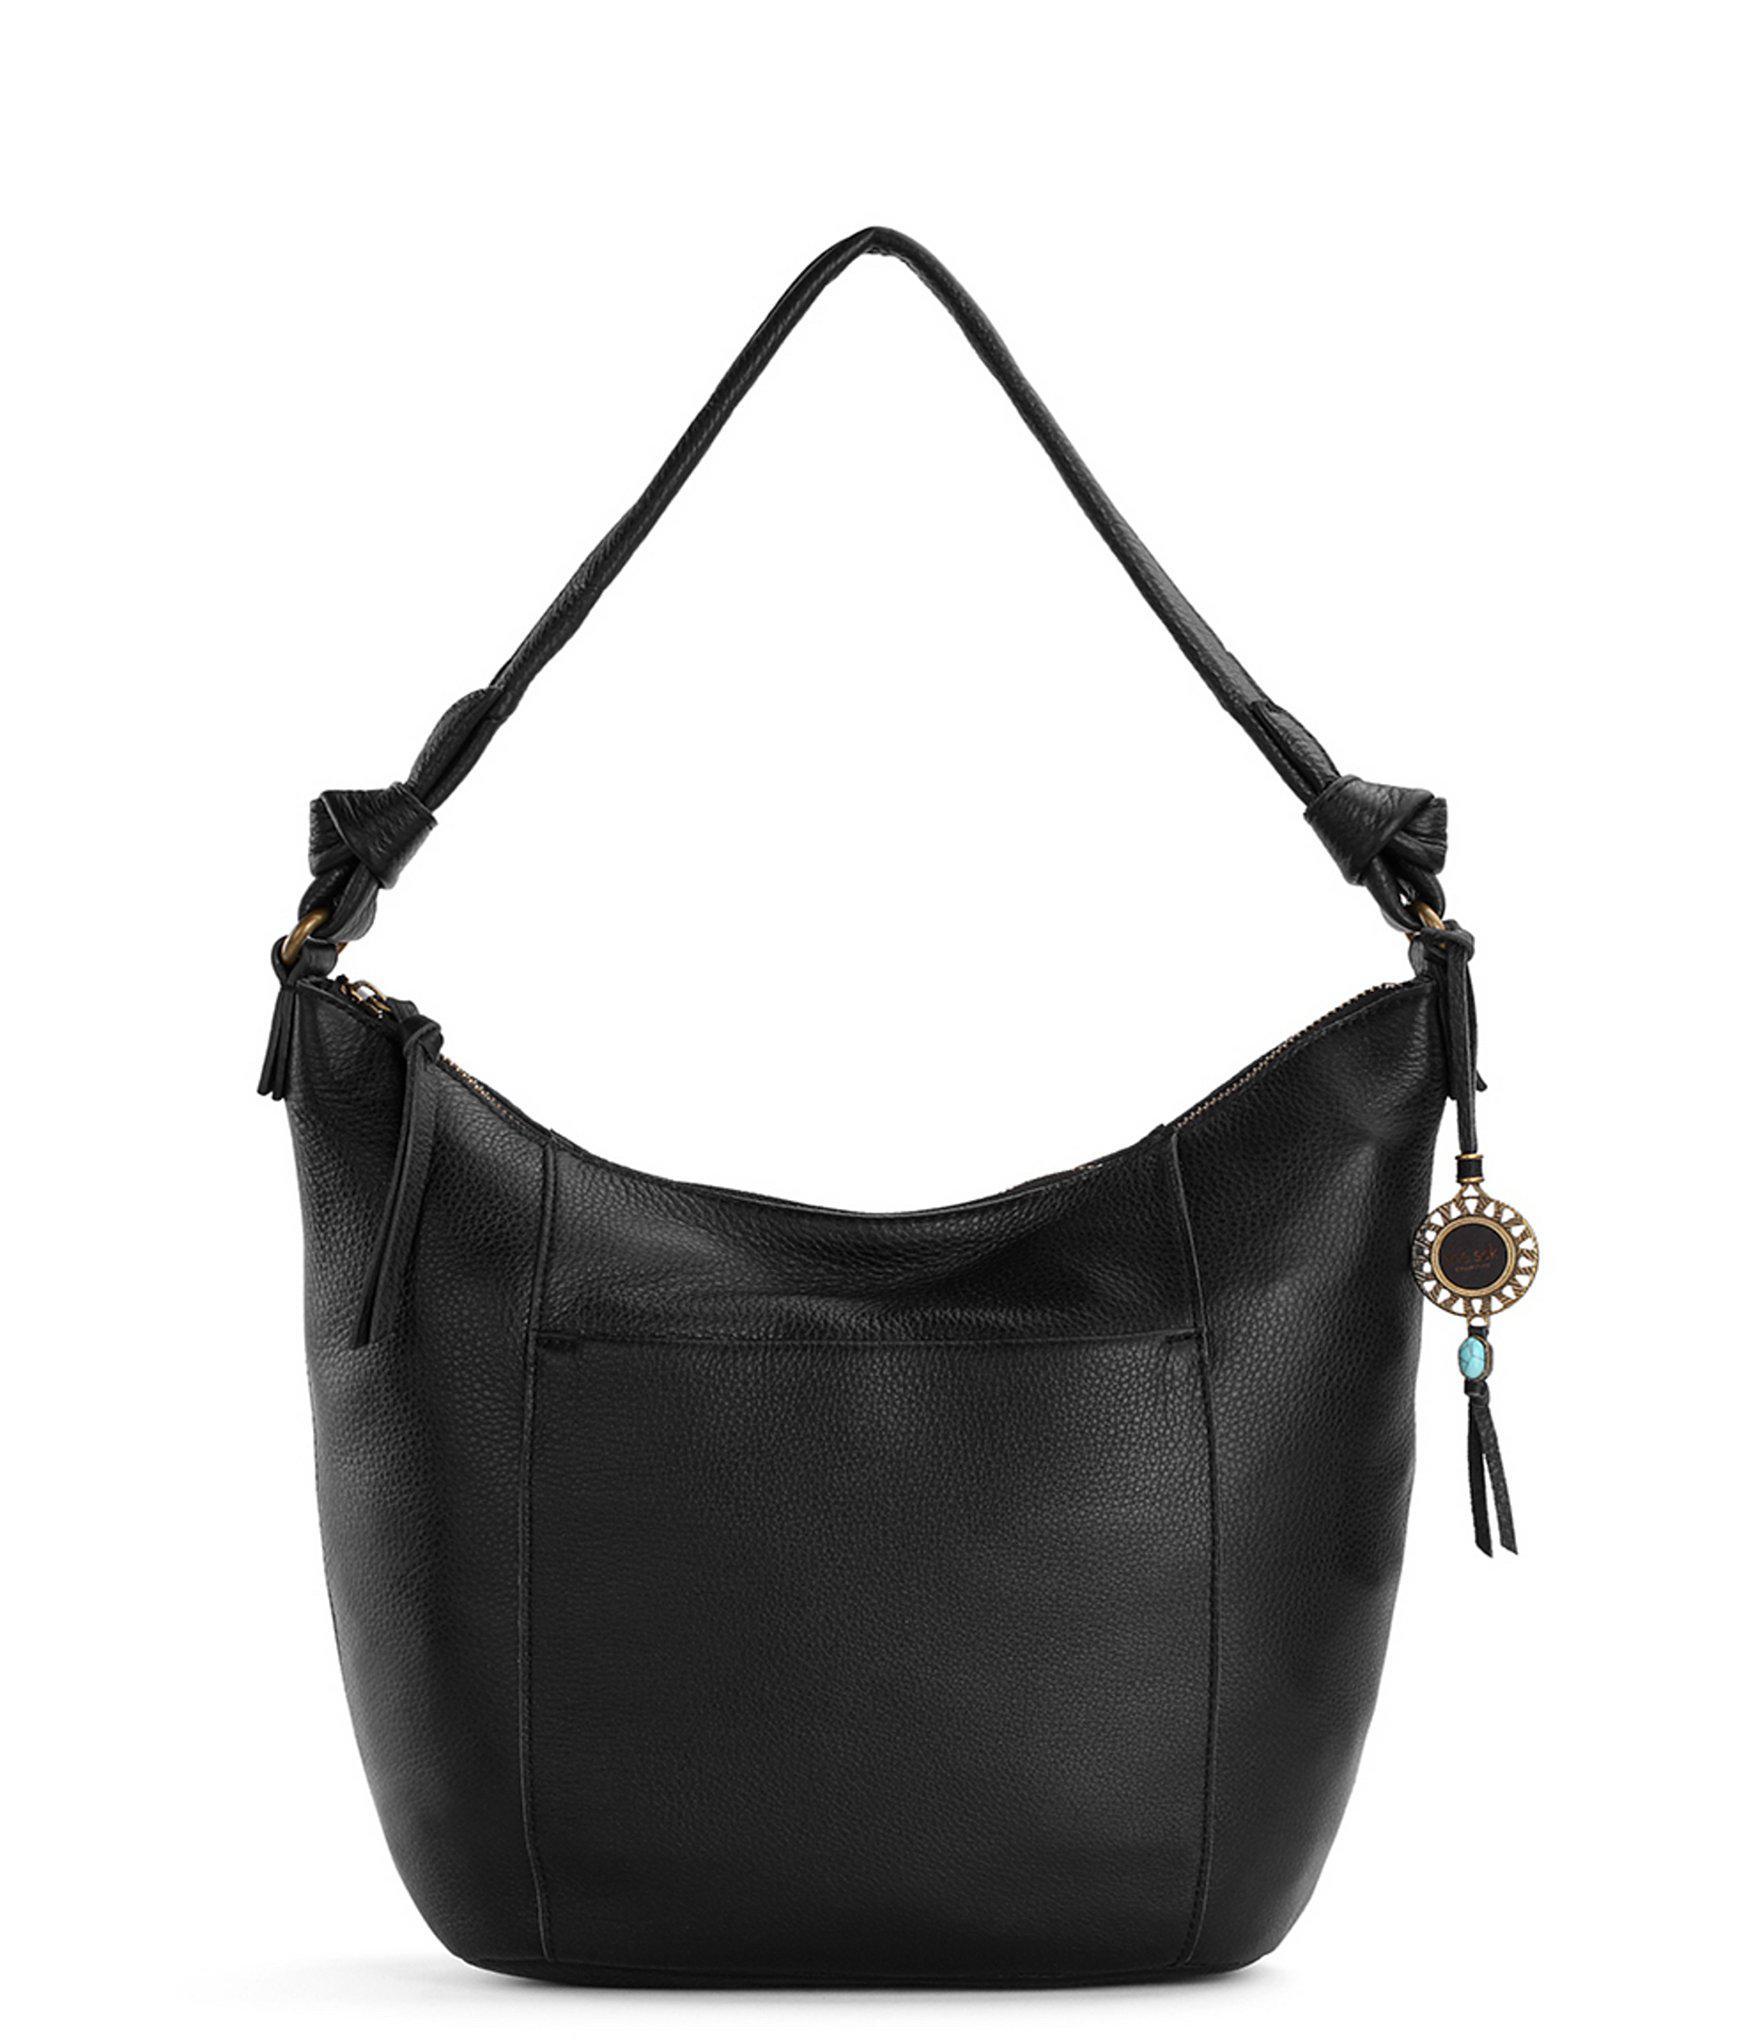 717f3062dc4 Lyst - The Sak Collective Spruce Hobo Bag in Black